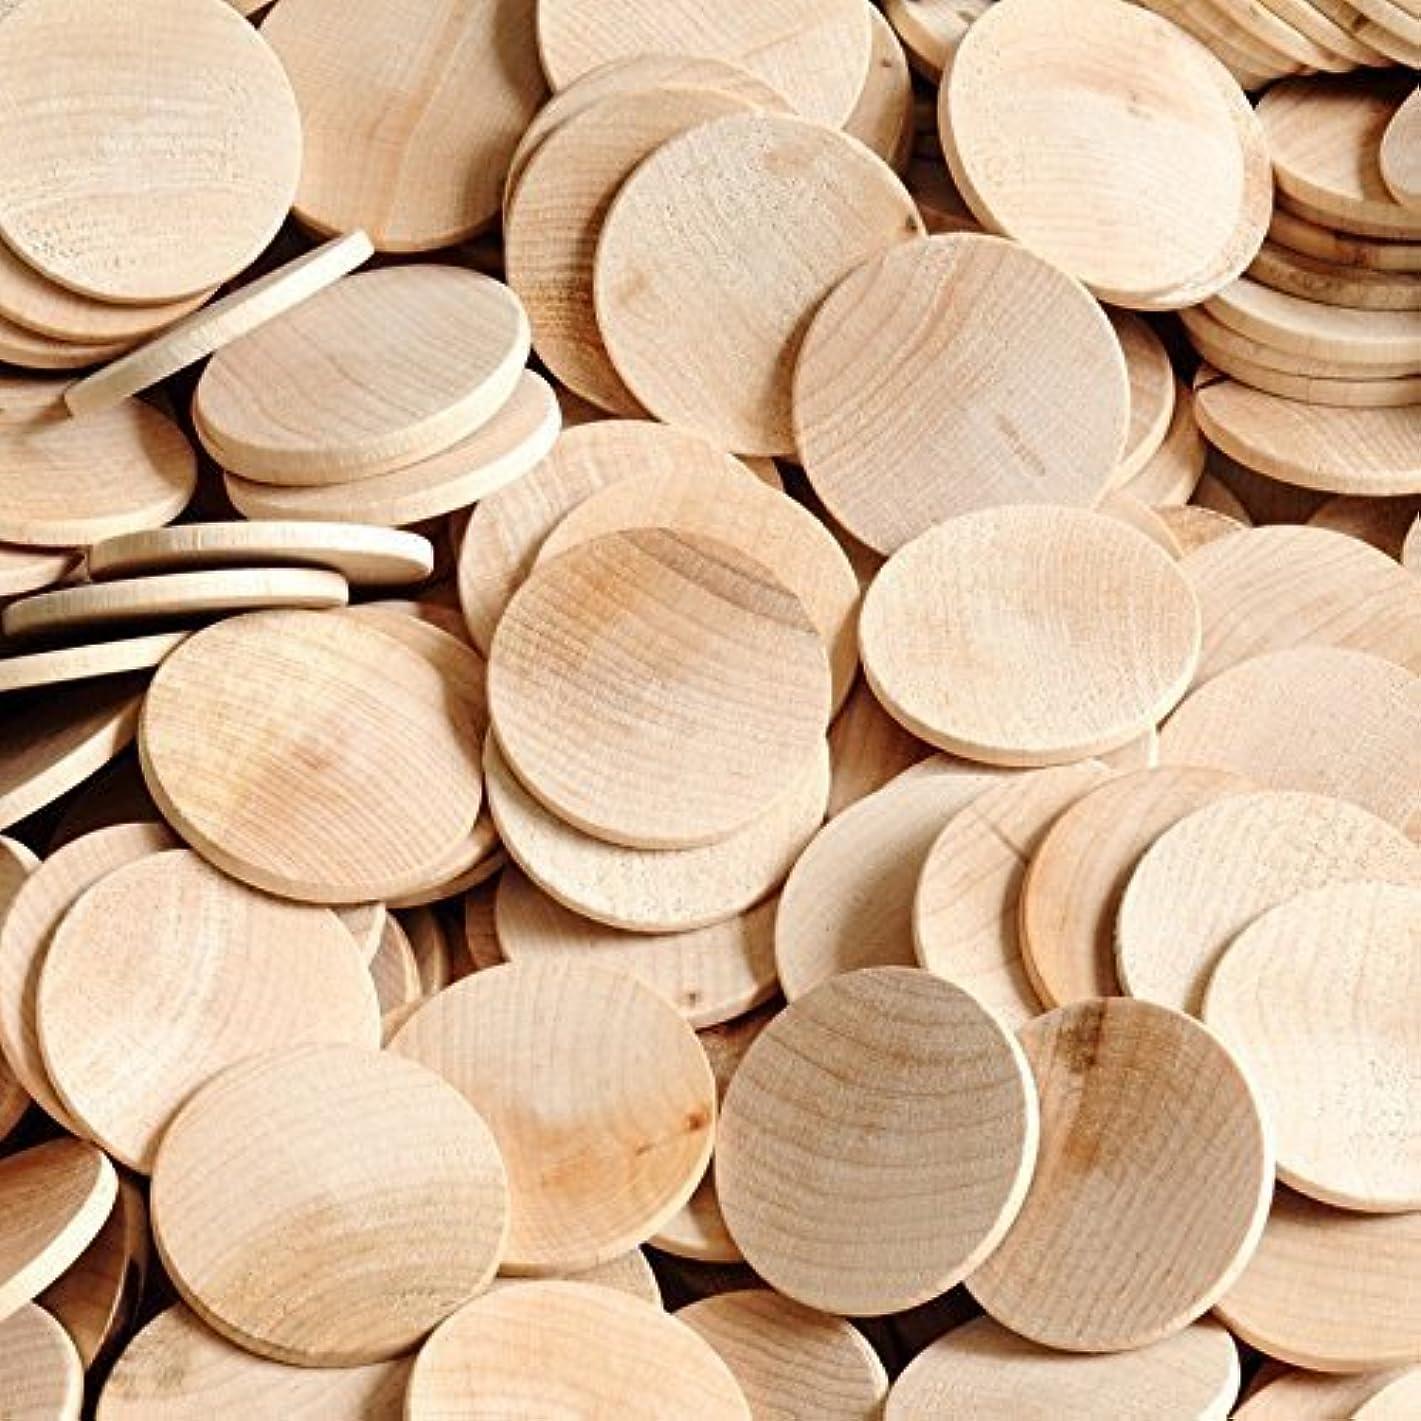 Wooden Circles 1-1/2